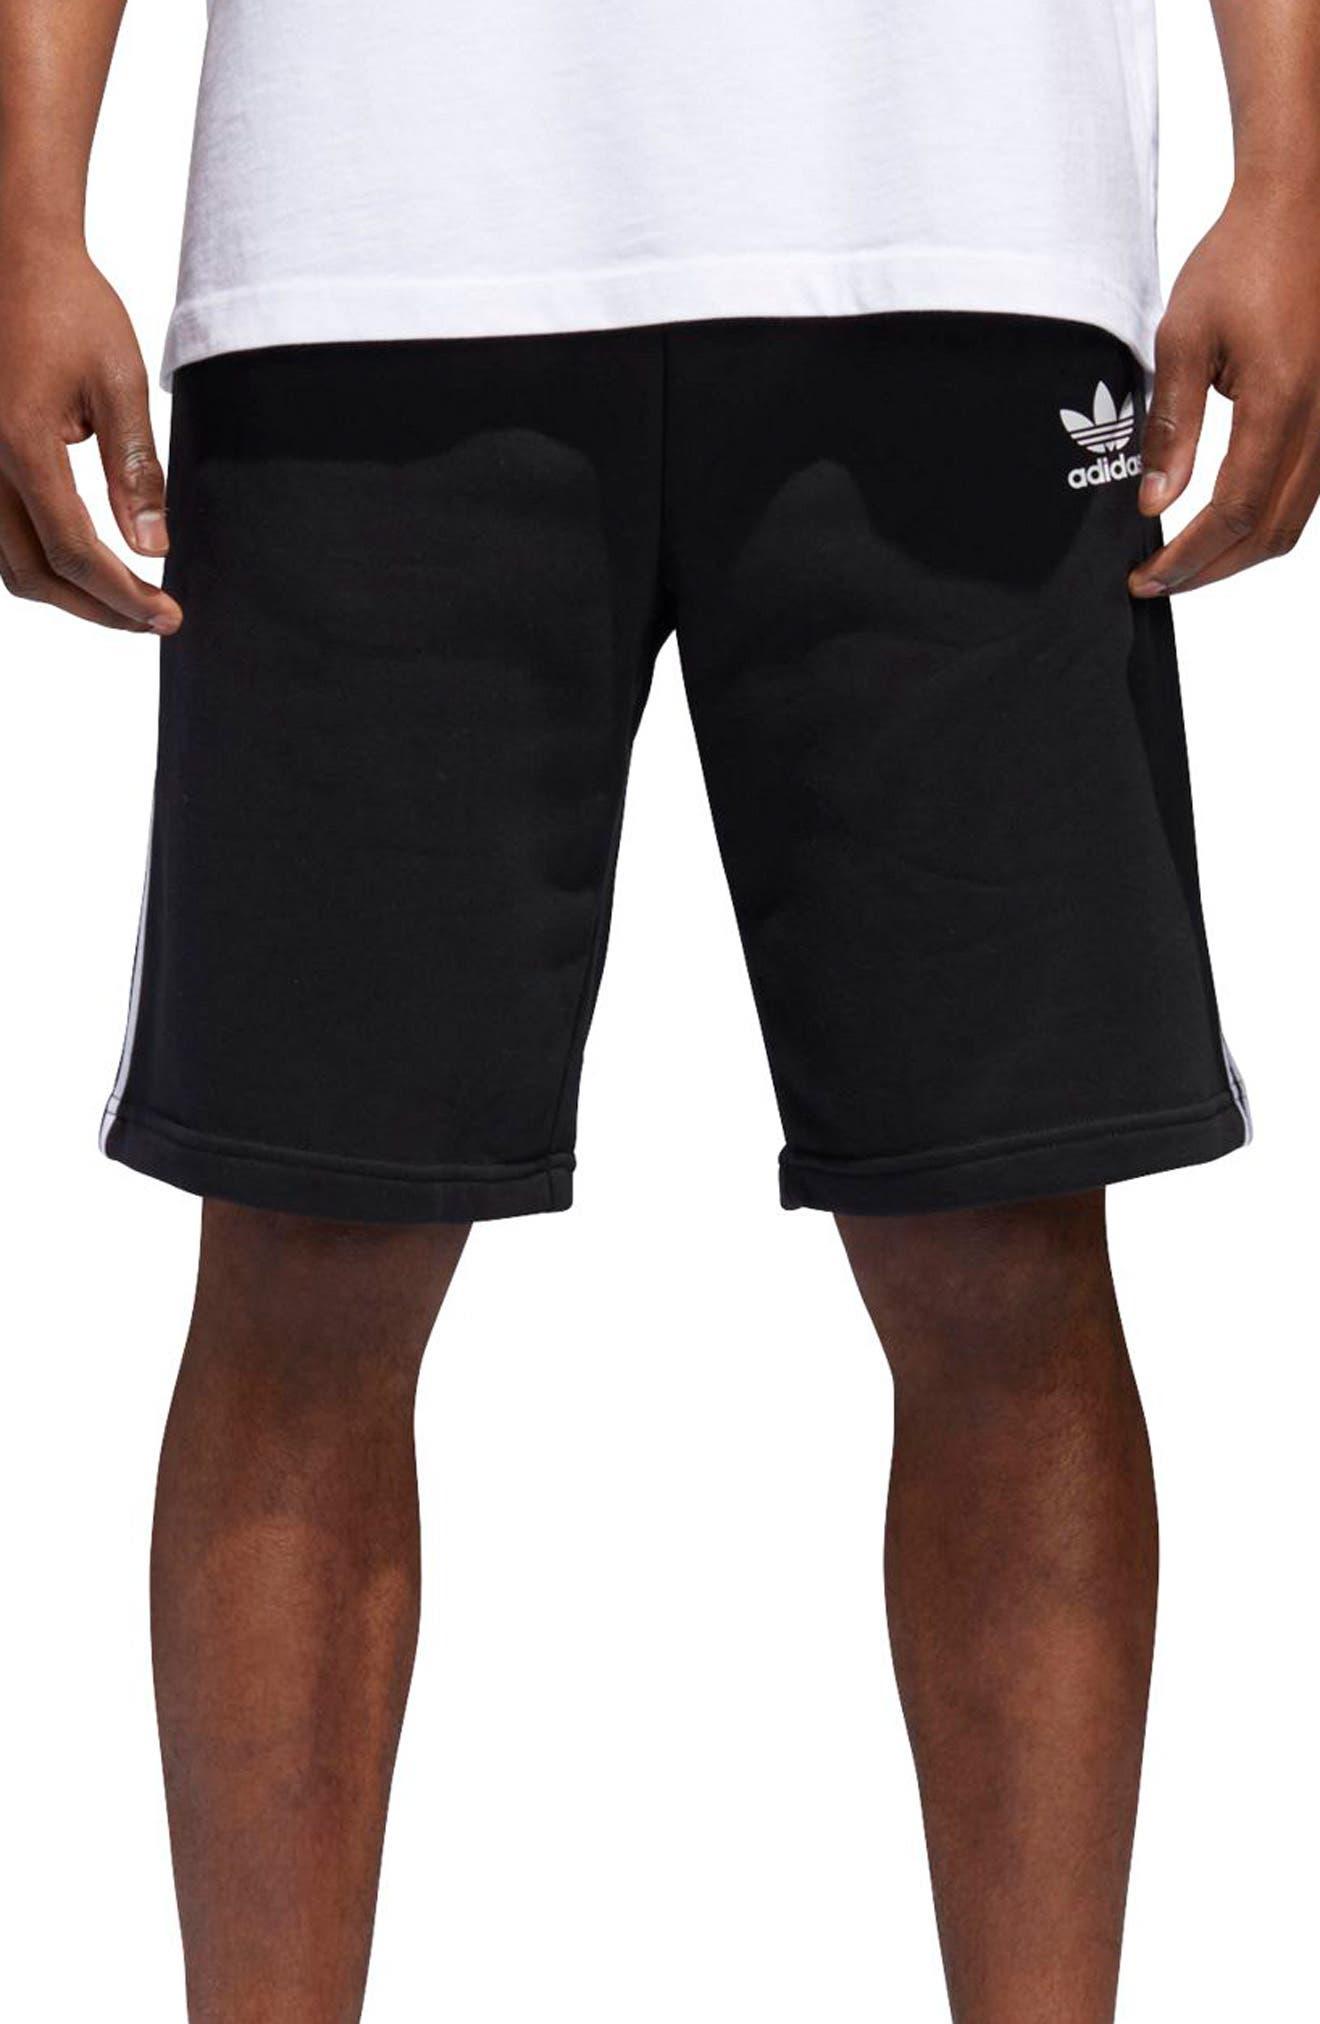 3-Stripes Shorts,                         Main,                         color, BLACK/ WHITE